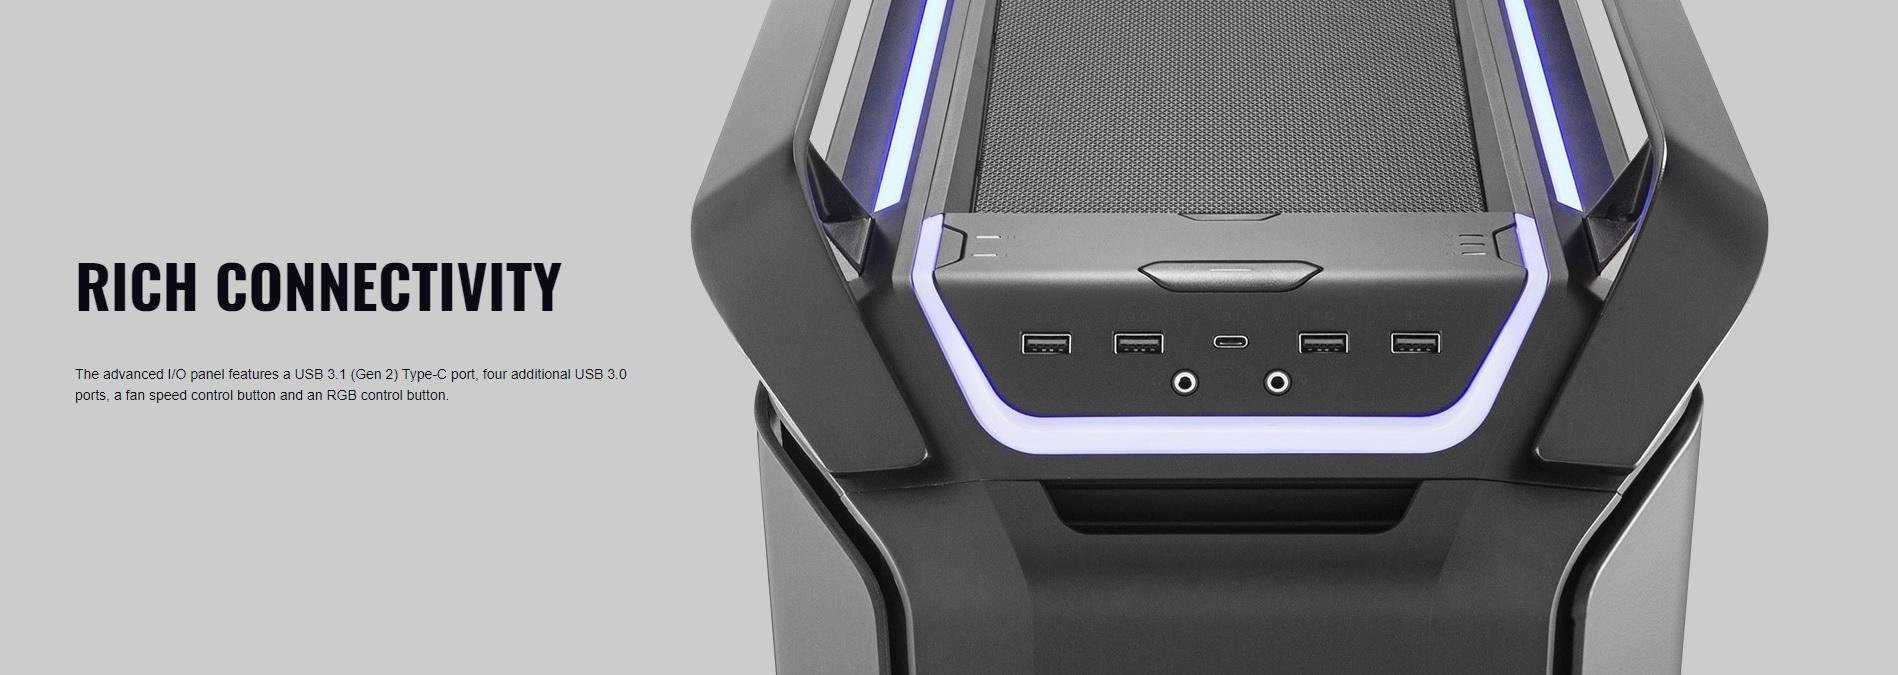 Case Cooler Master Cosmos C700P Black Edition (Mid Tower/Màu Đen) giới thiệu 9